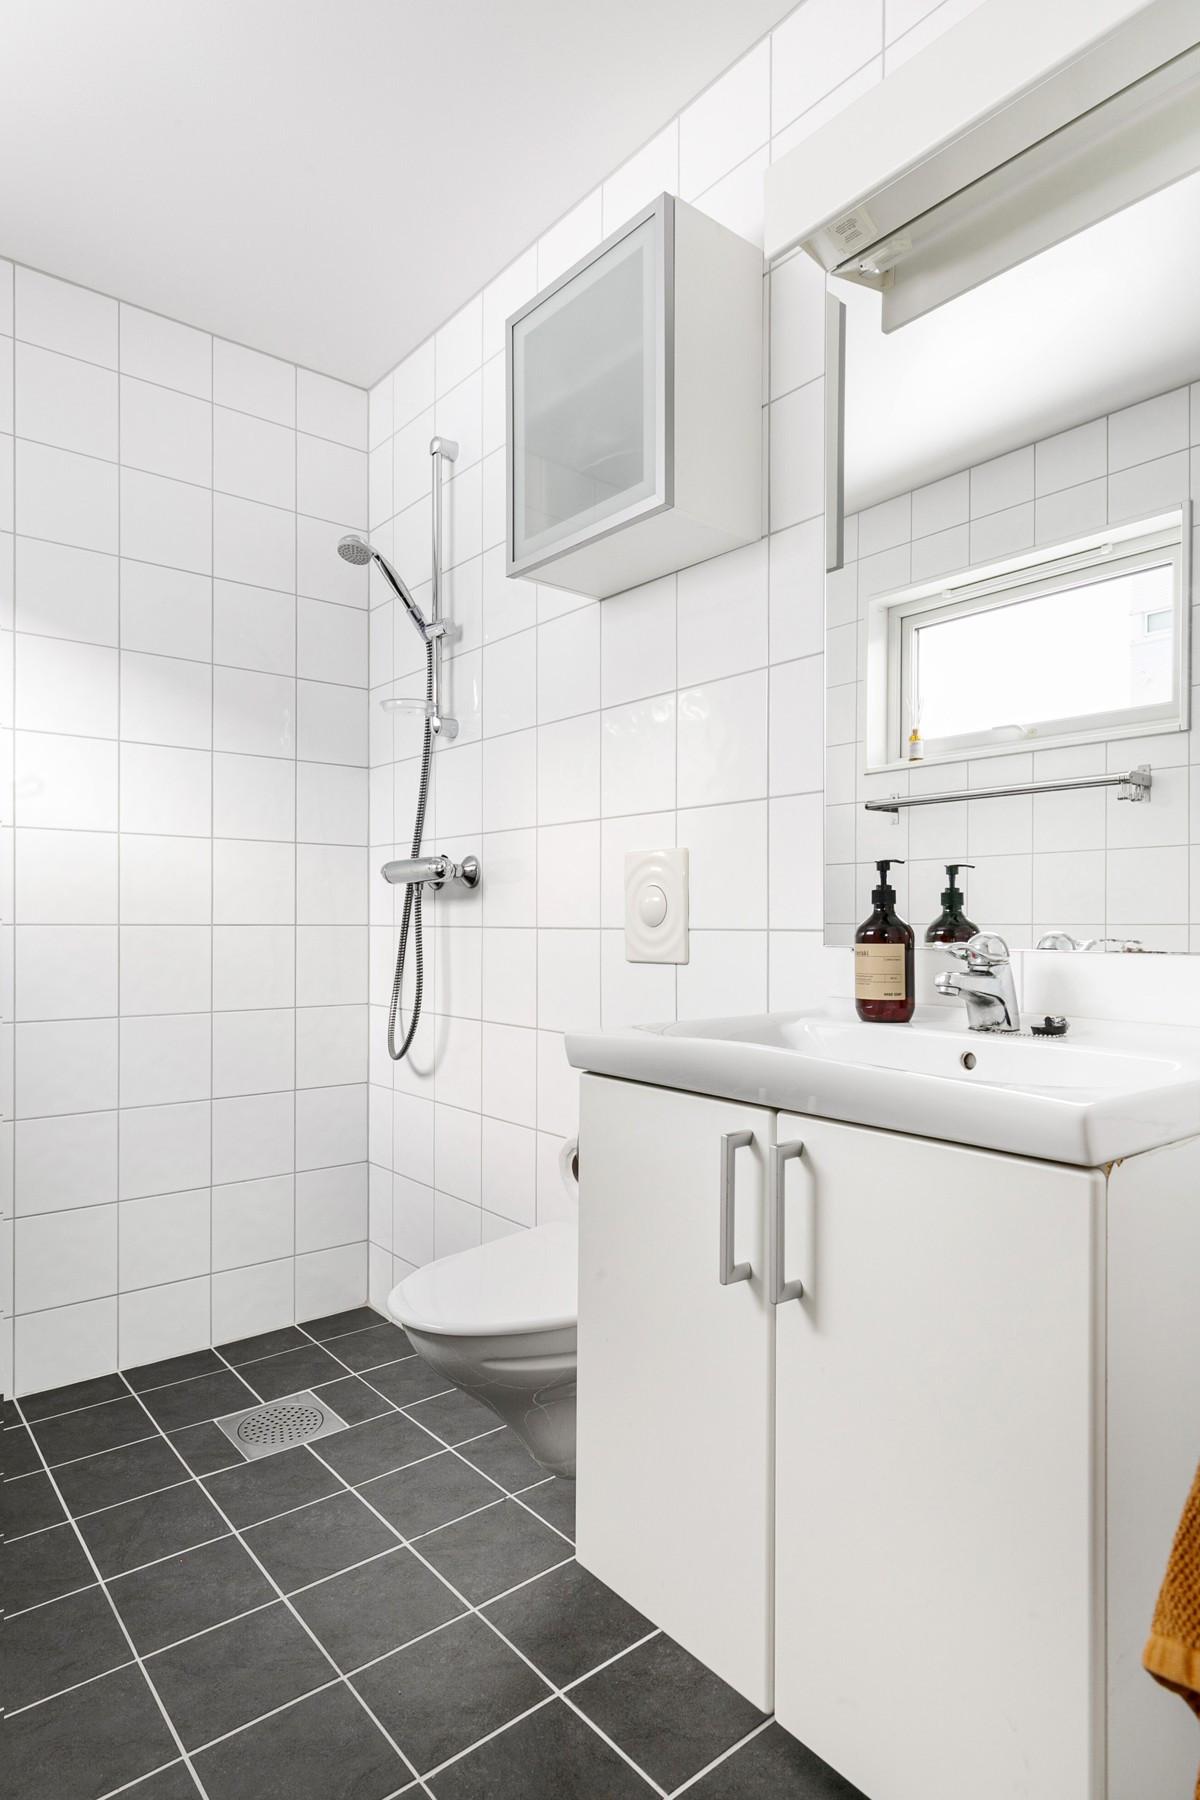 Komplett flislagt bad med gulvvarme i 1. etasje